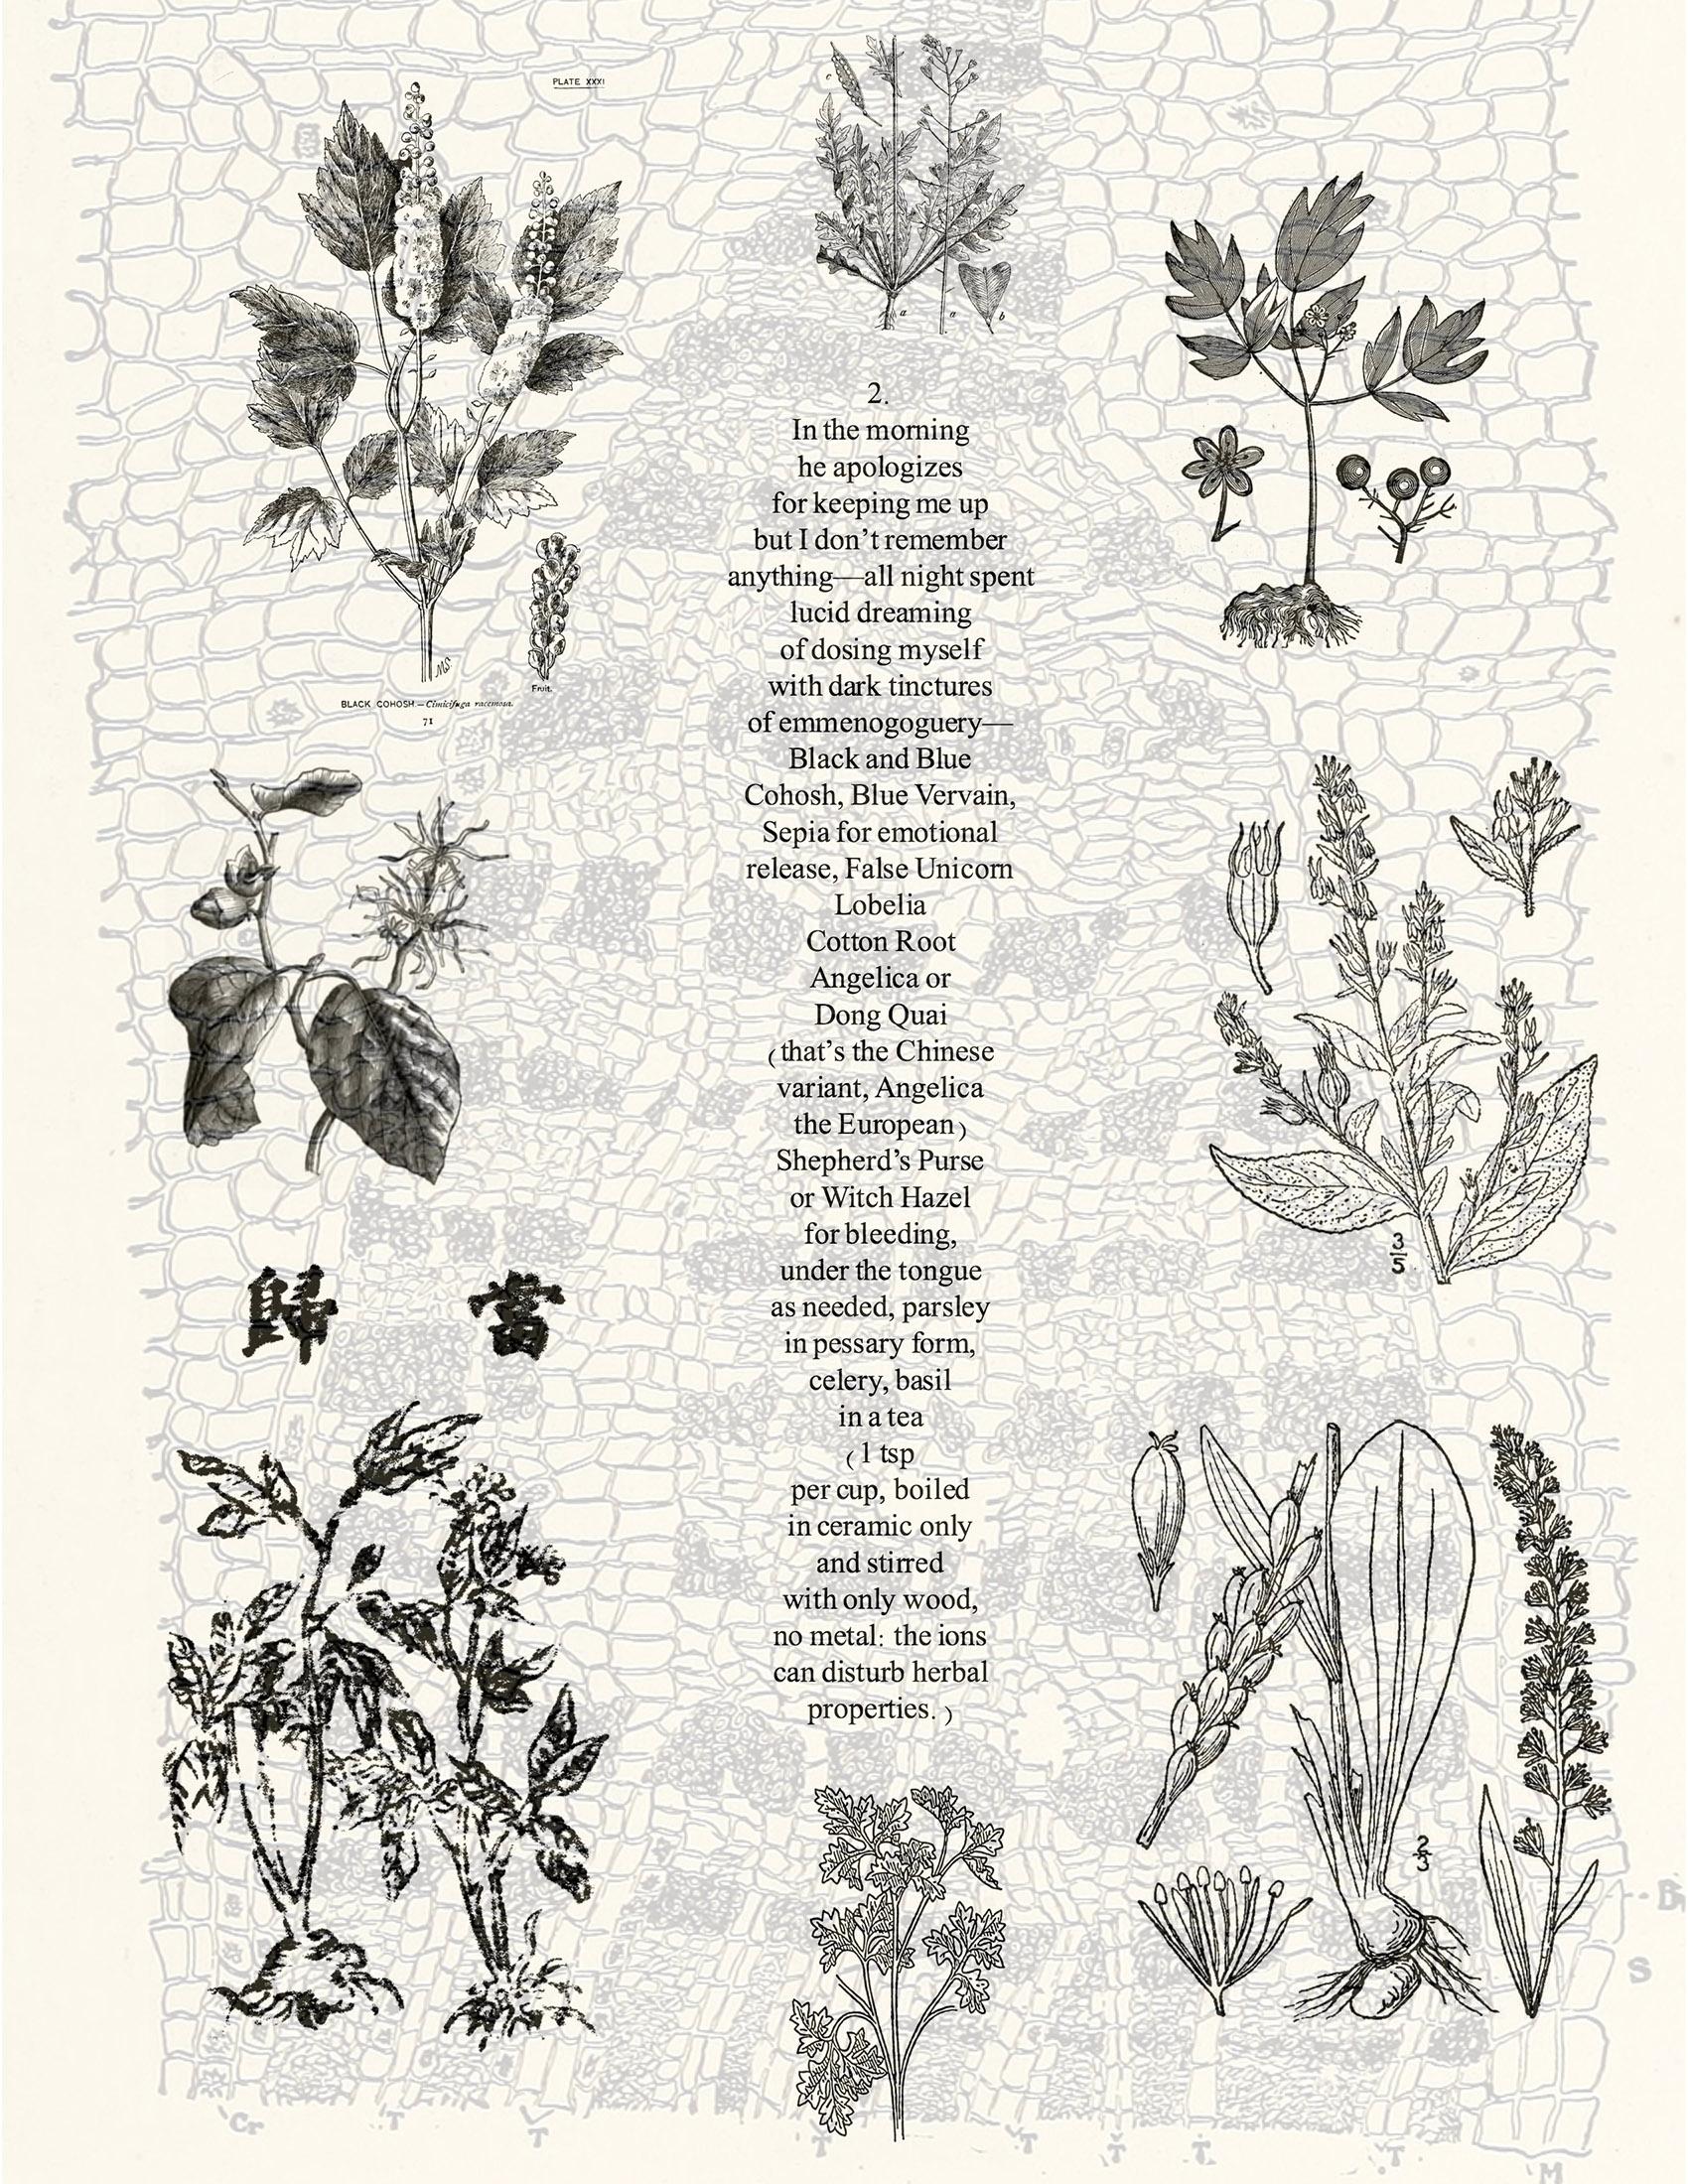 poem referencing herbal remedies superimposed over botanical illustrations of herbs